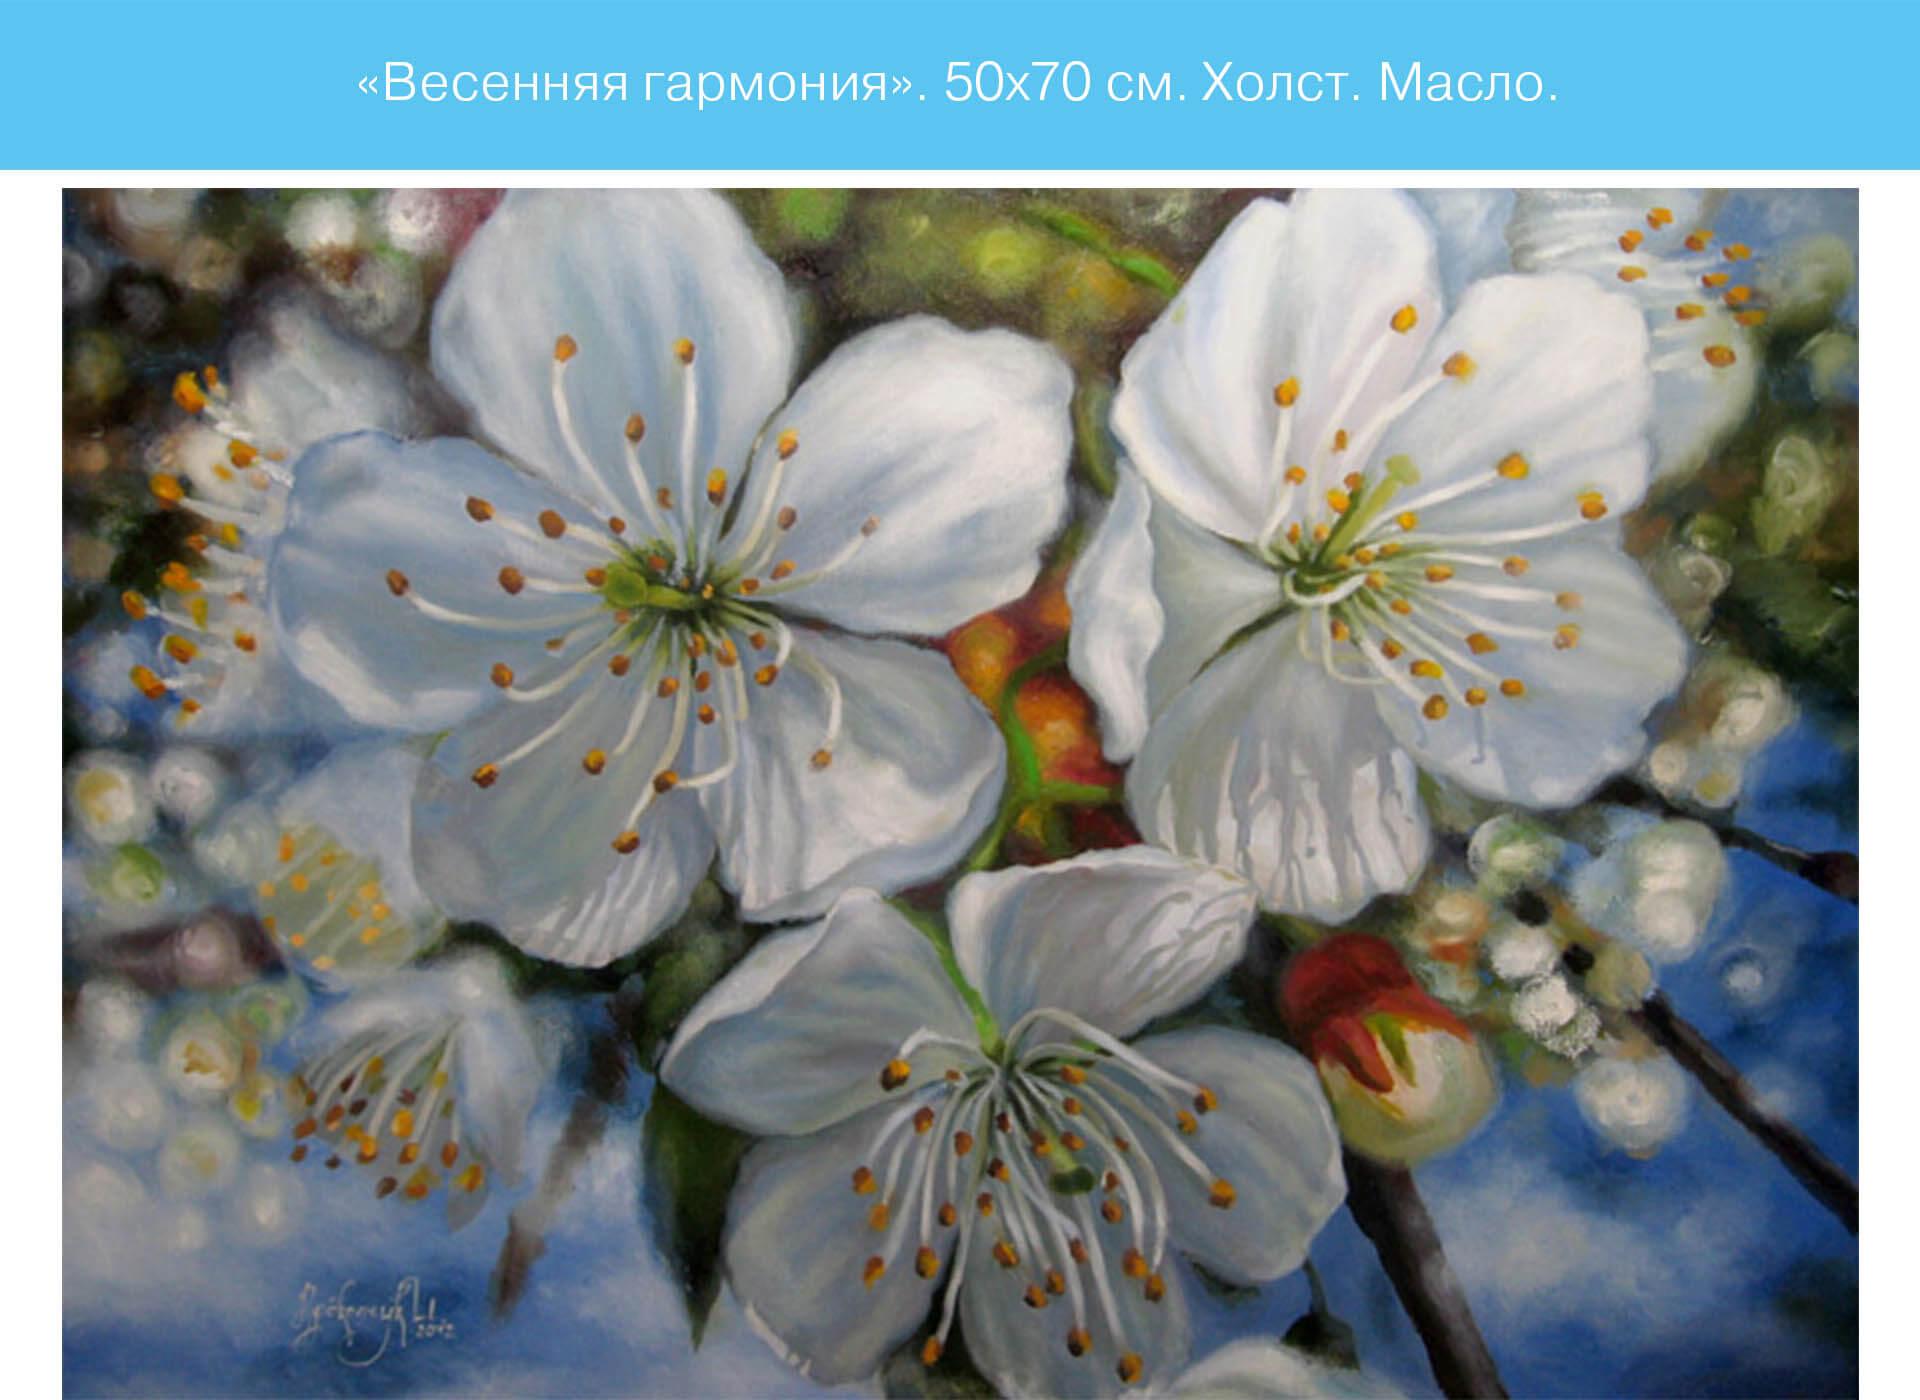 Prokochuk_Irina_picture_vesennyaya garmoniya